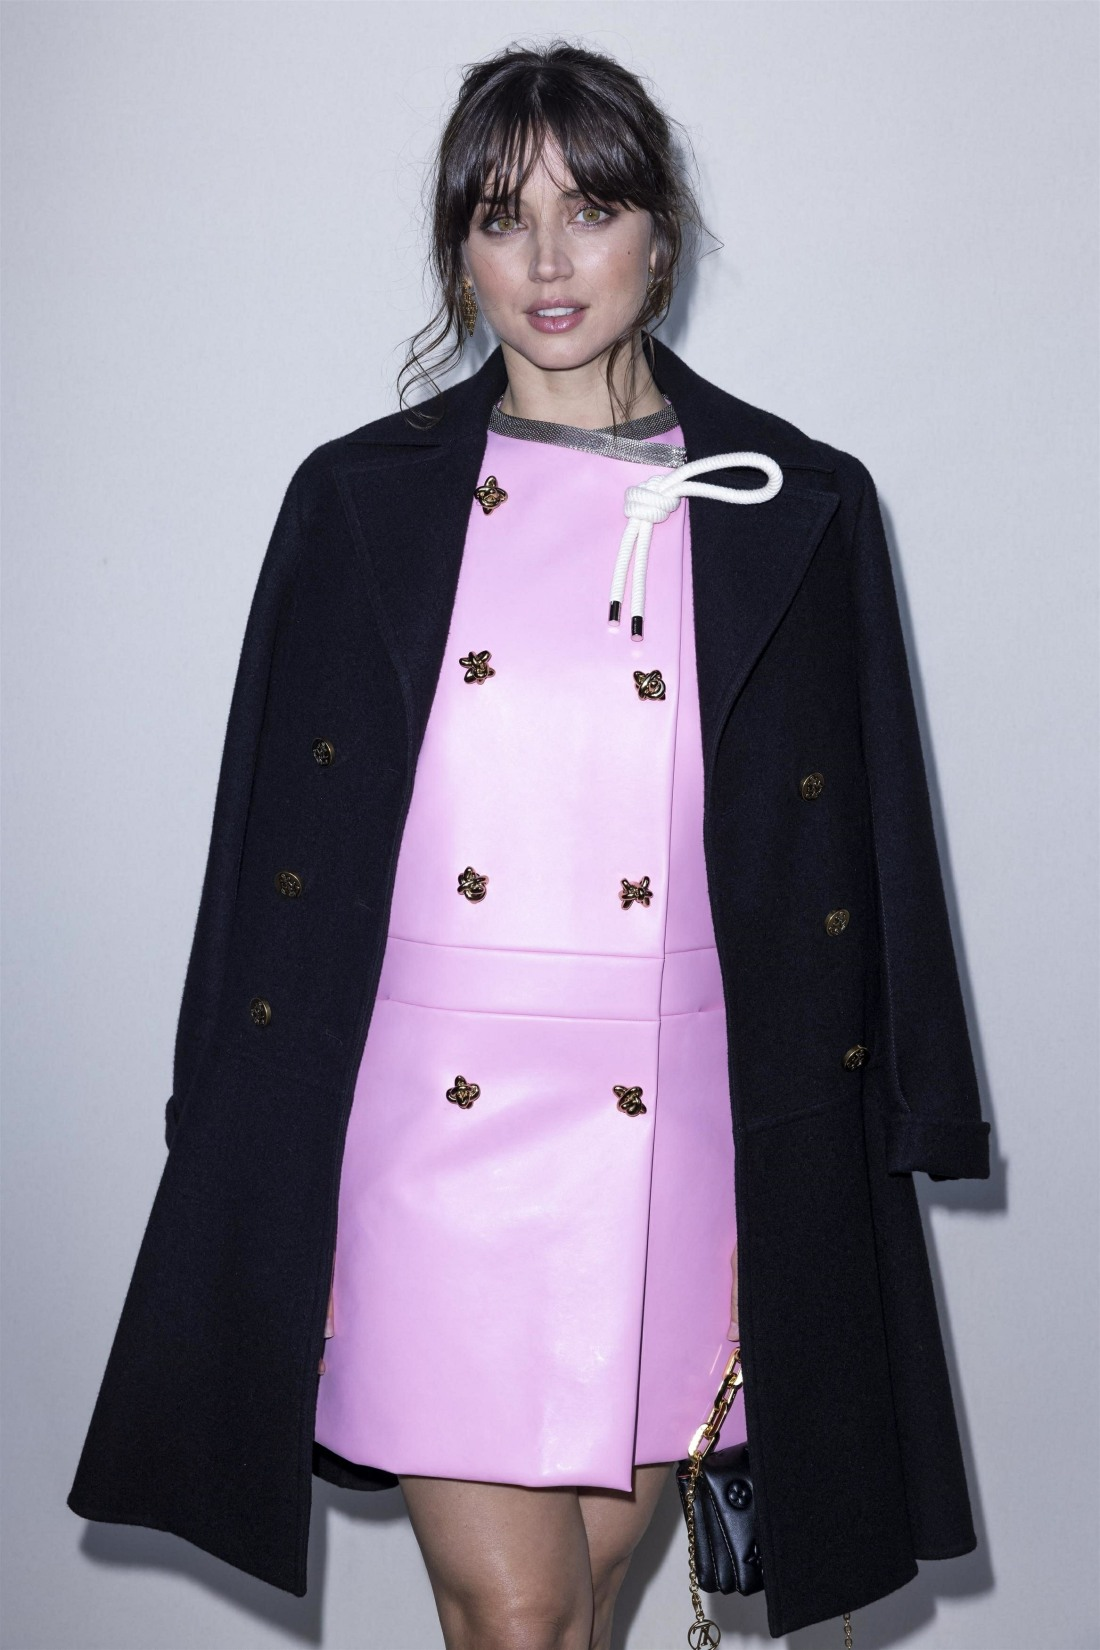 Celebrities attend the Louis Vuitton fashion show during Paris Fashion Week